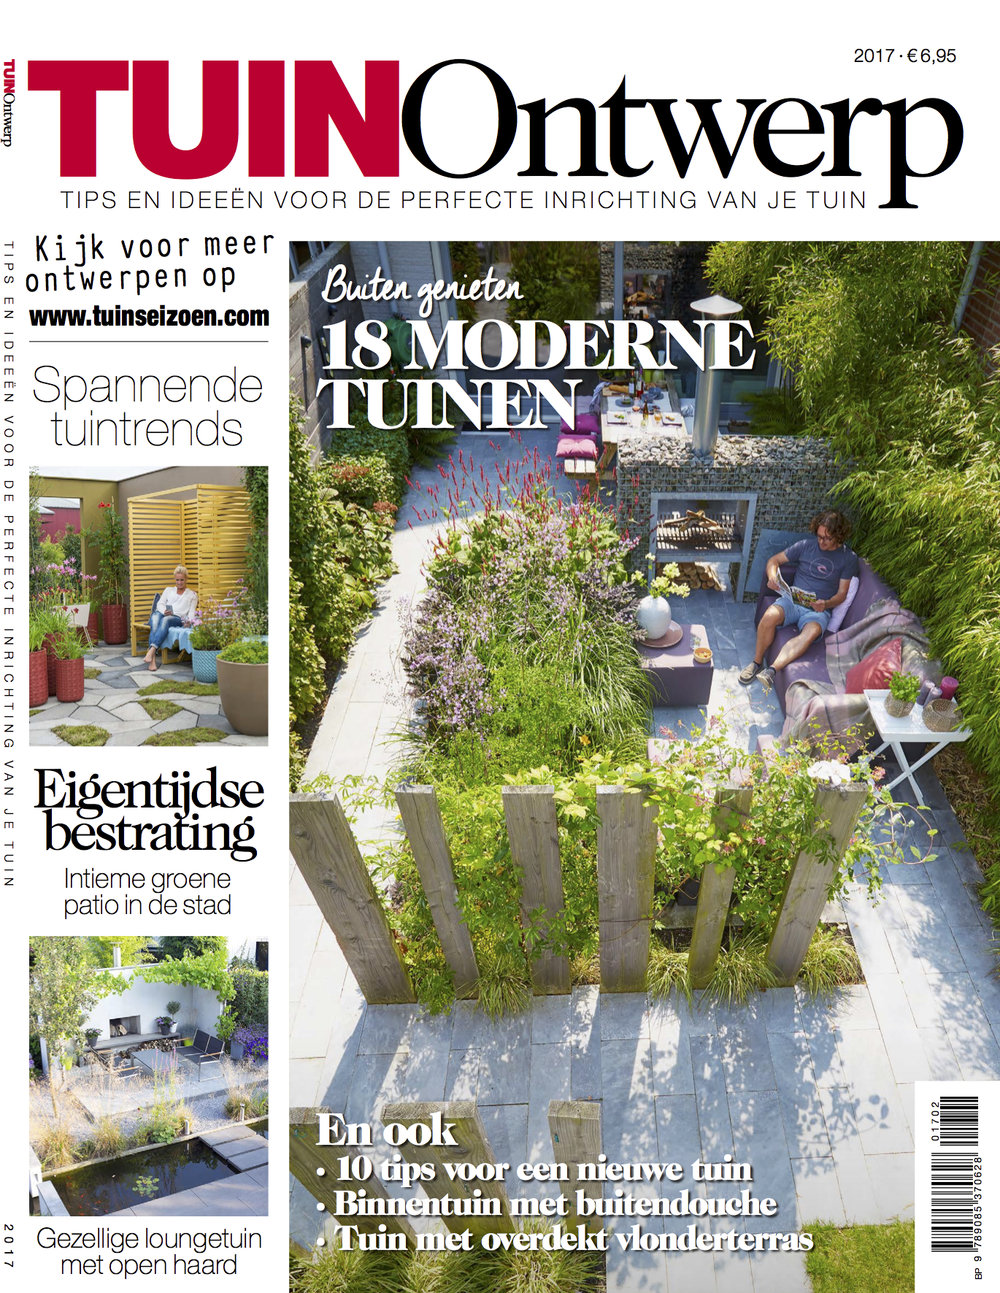 cover Tuinontwerp 2017 rood.jpg